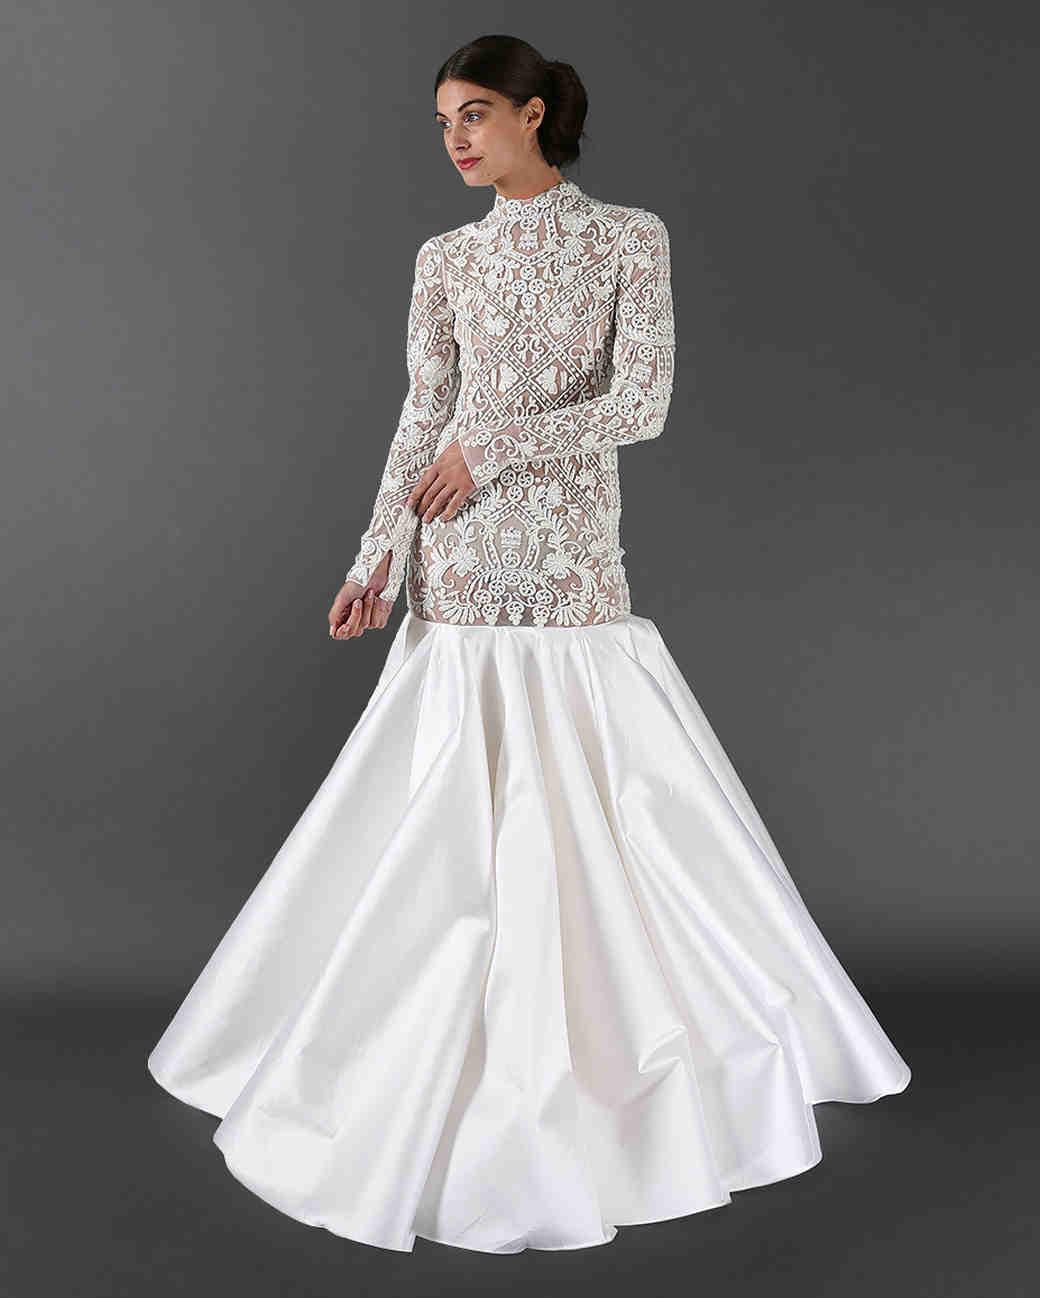 randi rahm wedding dresses fall party wedding dresses Randi Rahm Fall Wedding Dress Collection